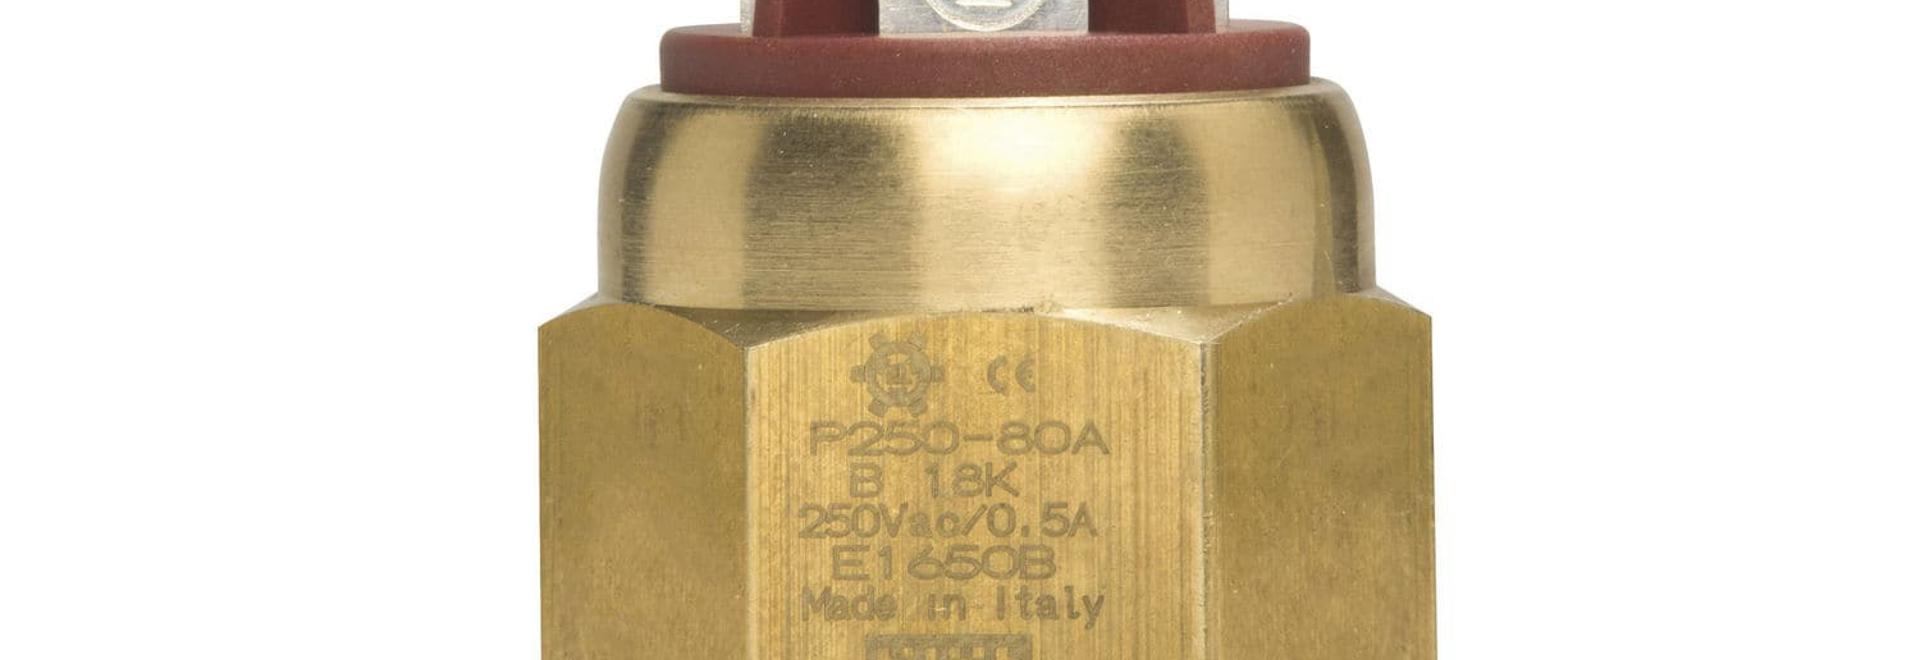 Mechanical Hydraulic Pressure Switch PM250